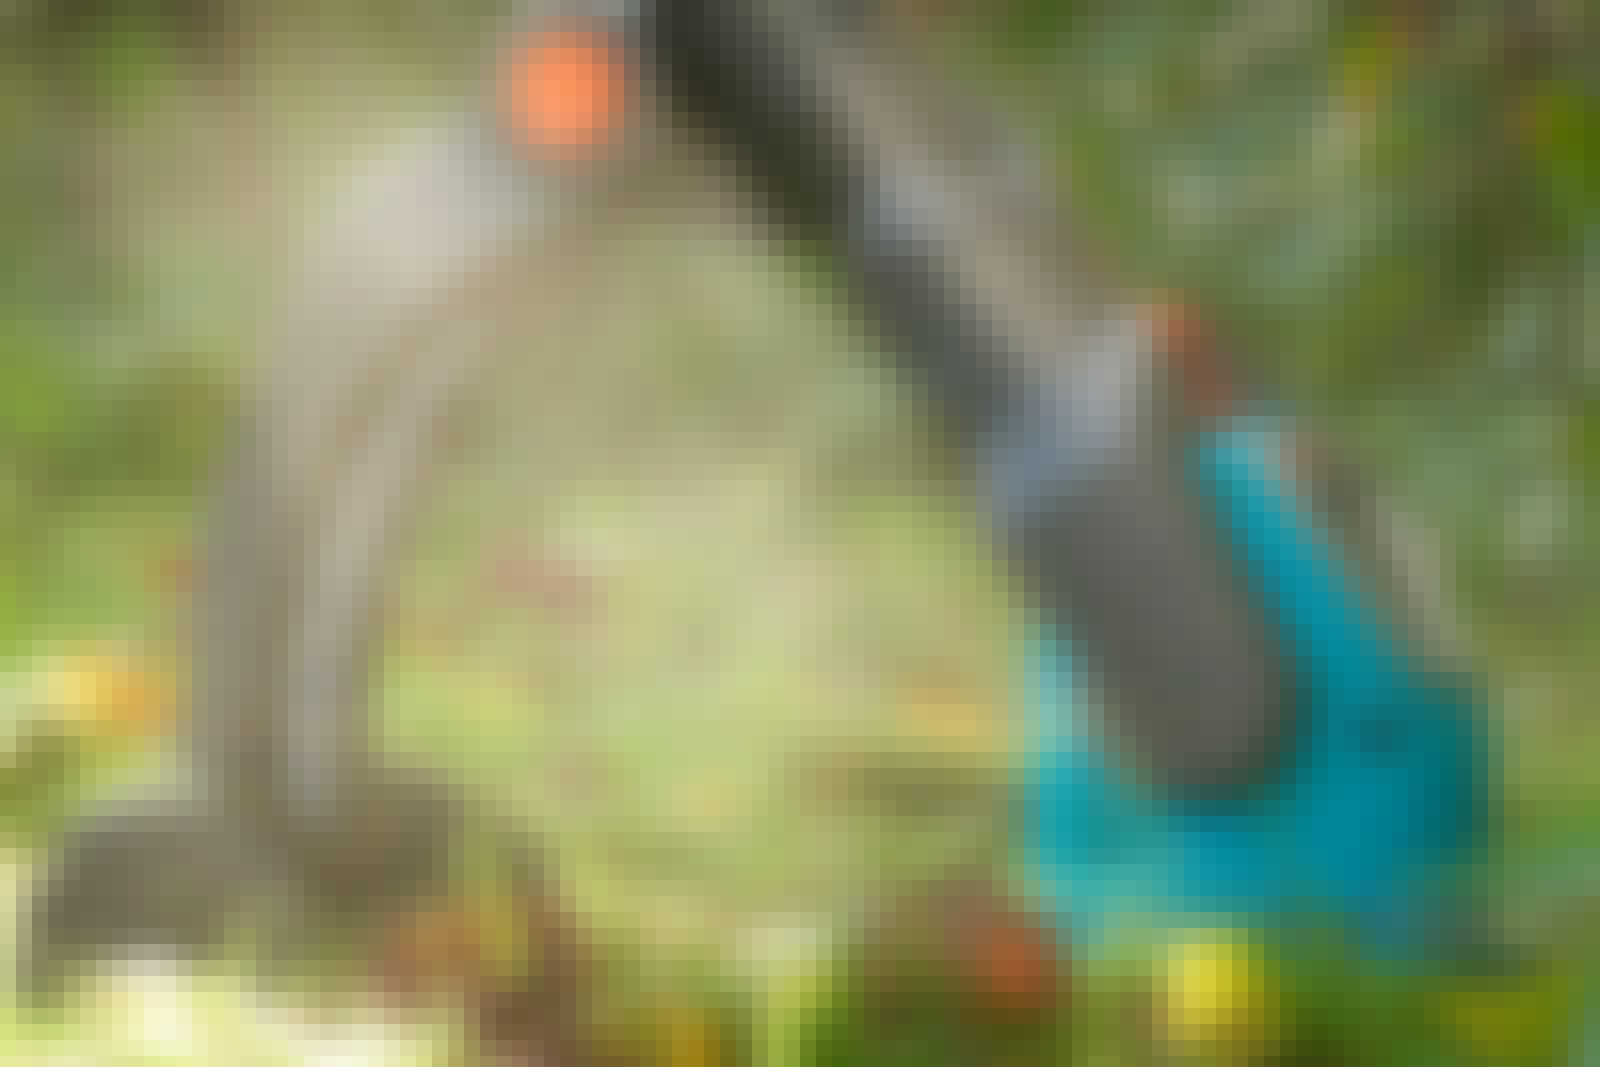 Trimmeri: Akku-, sähkö- vai bensamalli?